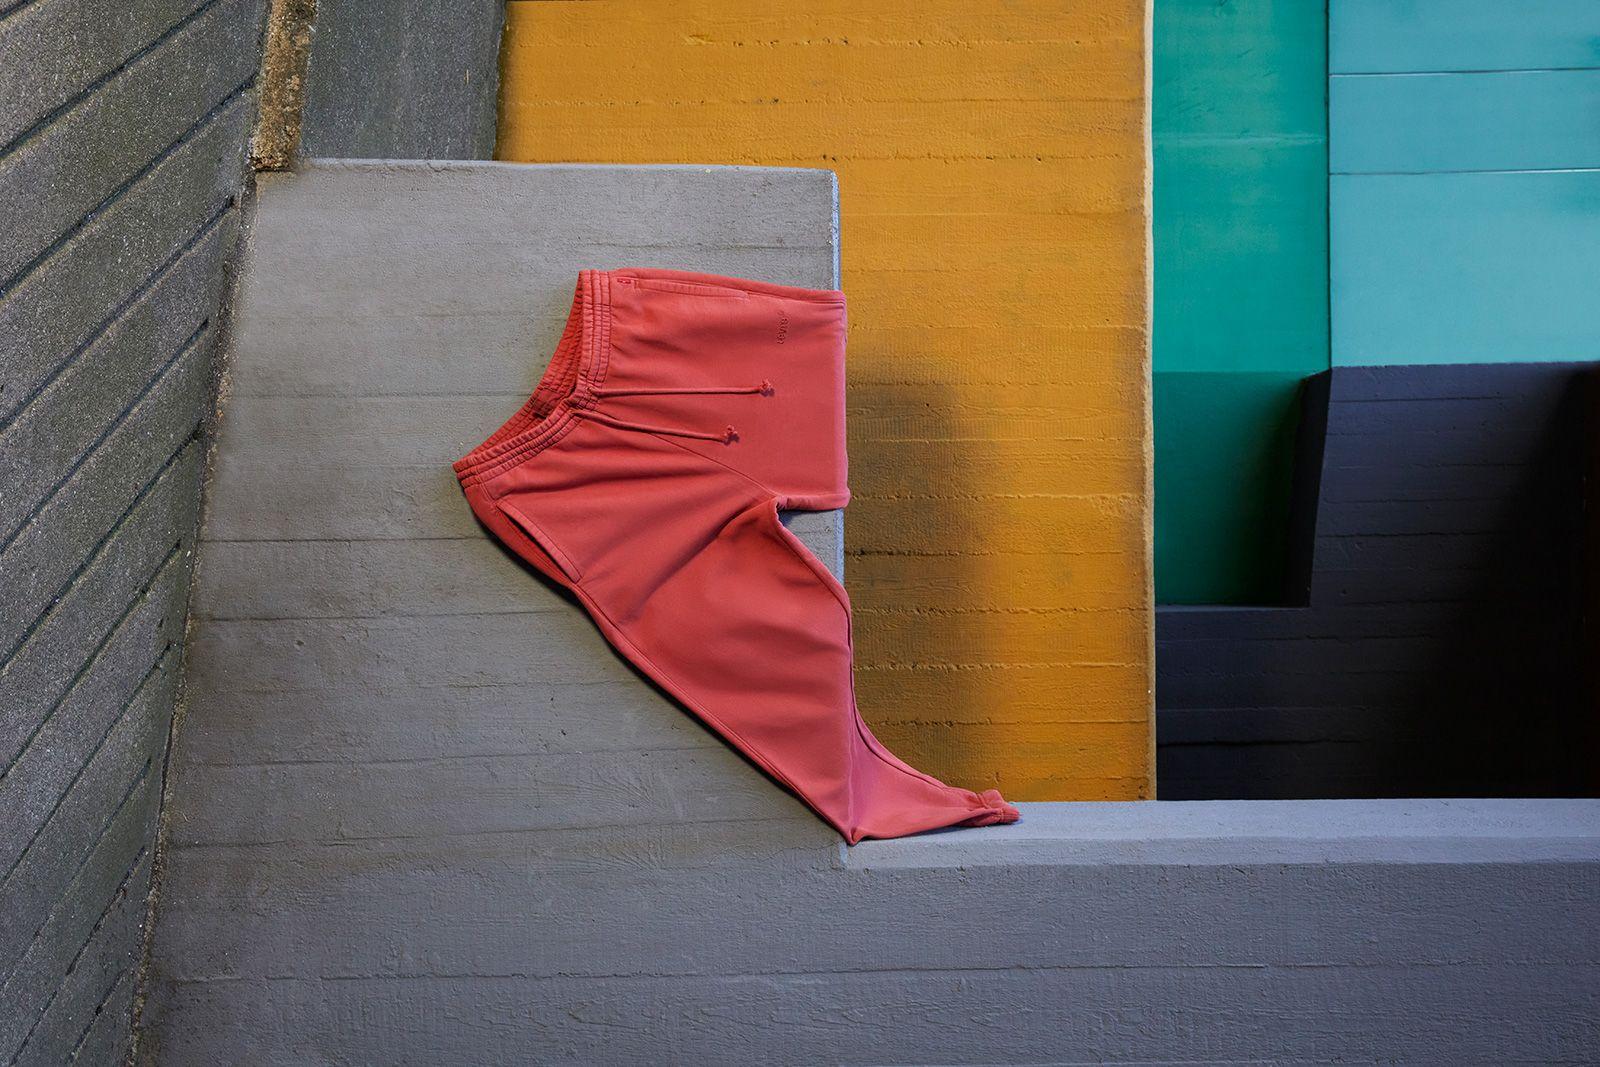 levis-red-tab-sweats-07